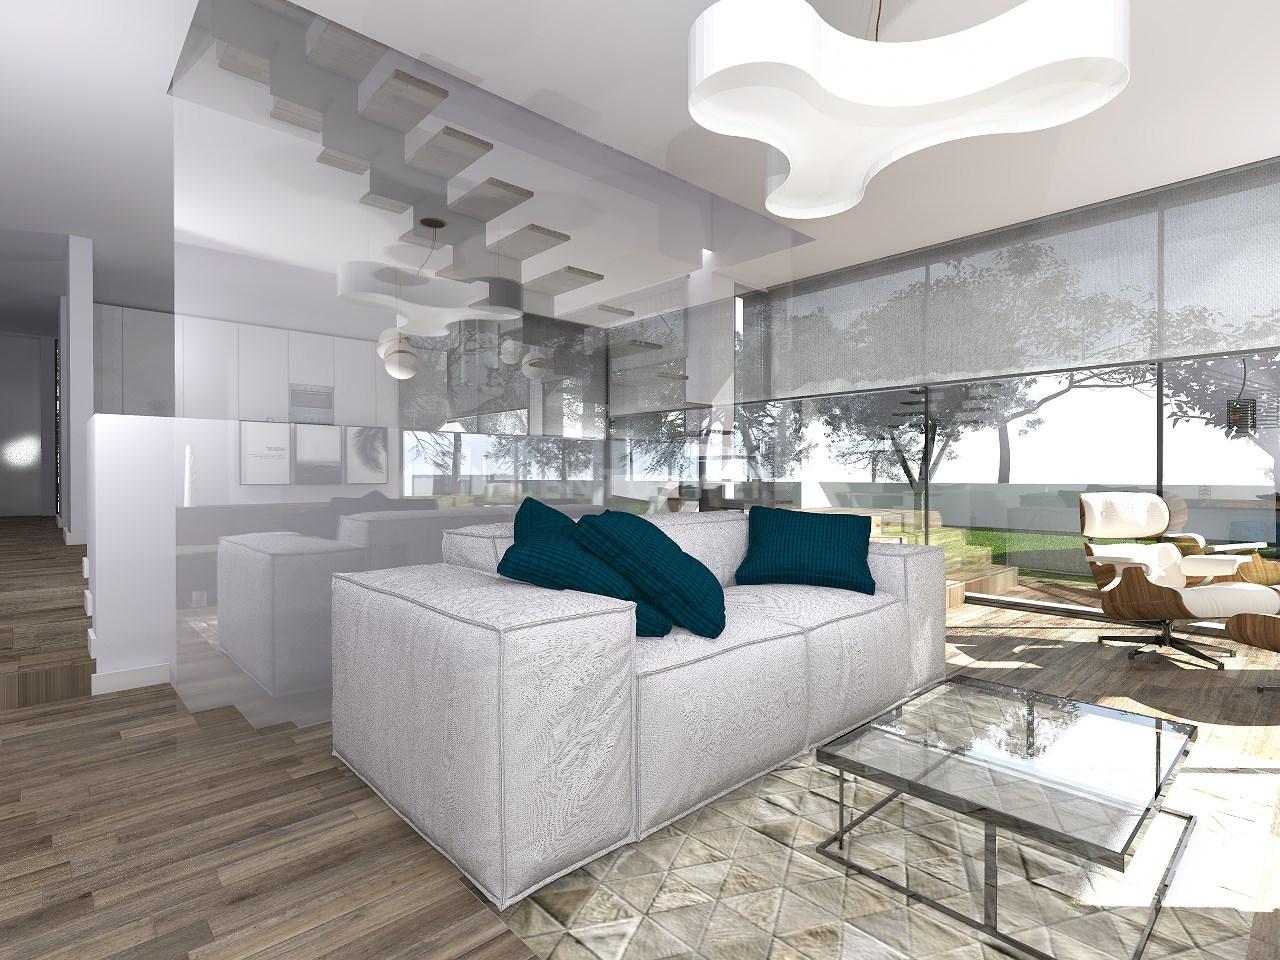 Apartment for sale in Algarve Silves